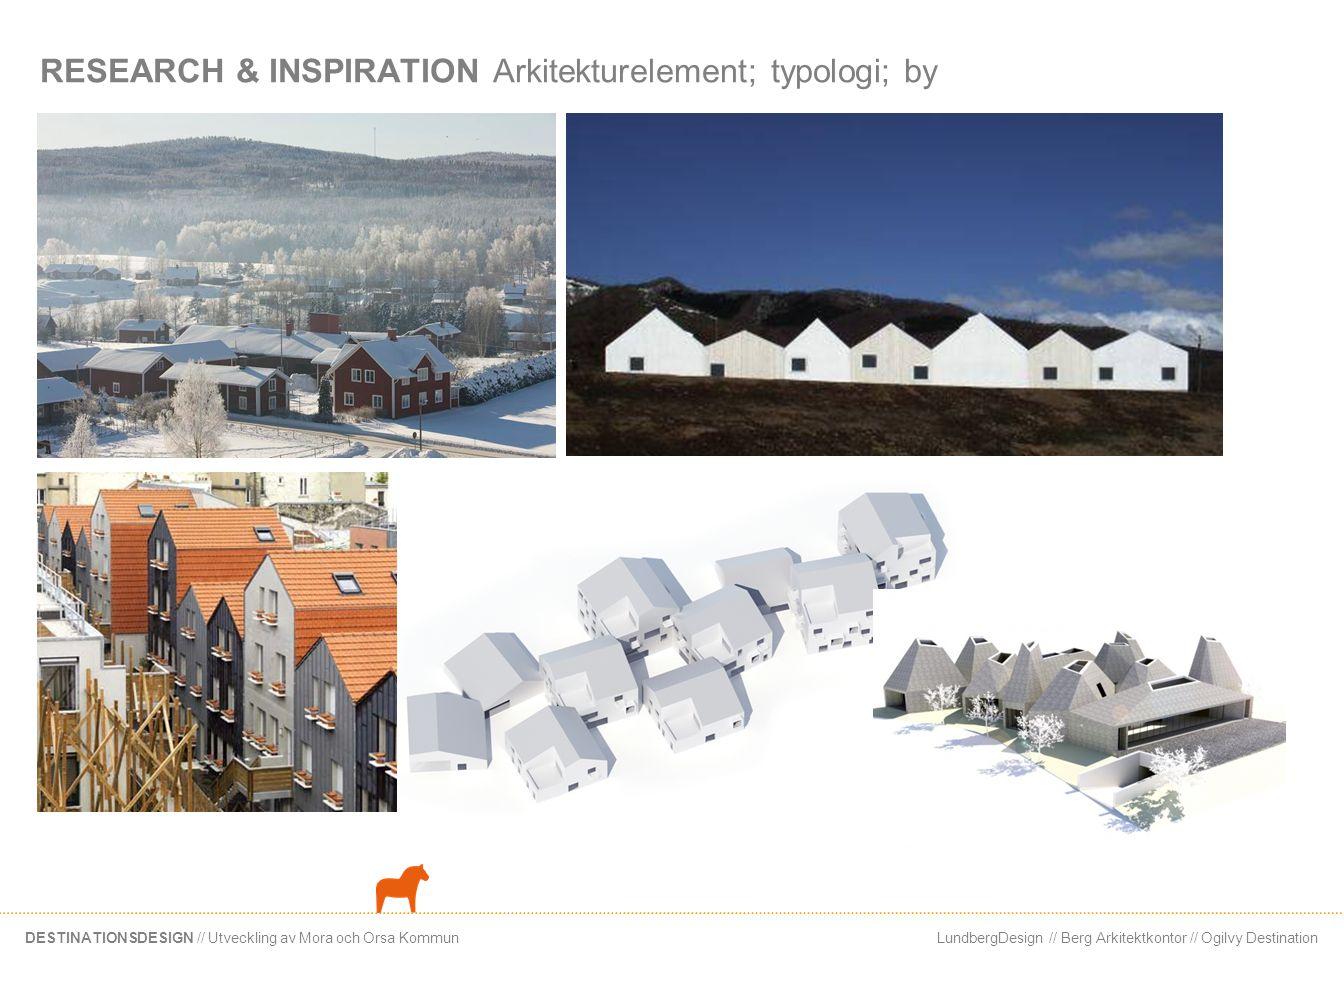 LundbergDesign // Berg Arkitektkontor // Ogilvy DestinationDESTINATIONSDESIGN // Utveckling av Mora och Orsa Kommun RESEARCH & INSPIRATION Arkitekture